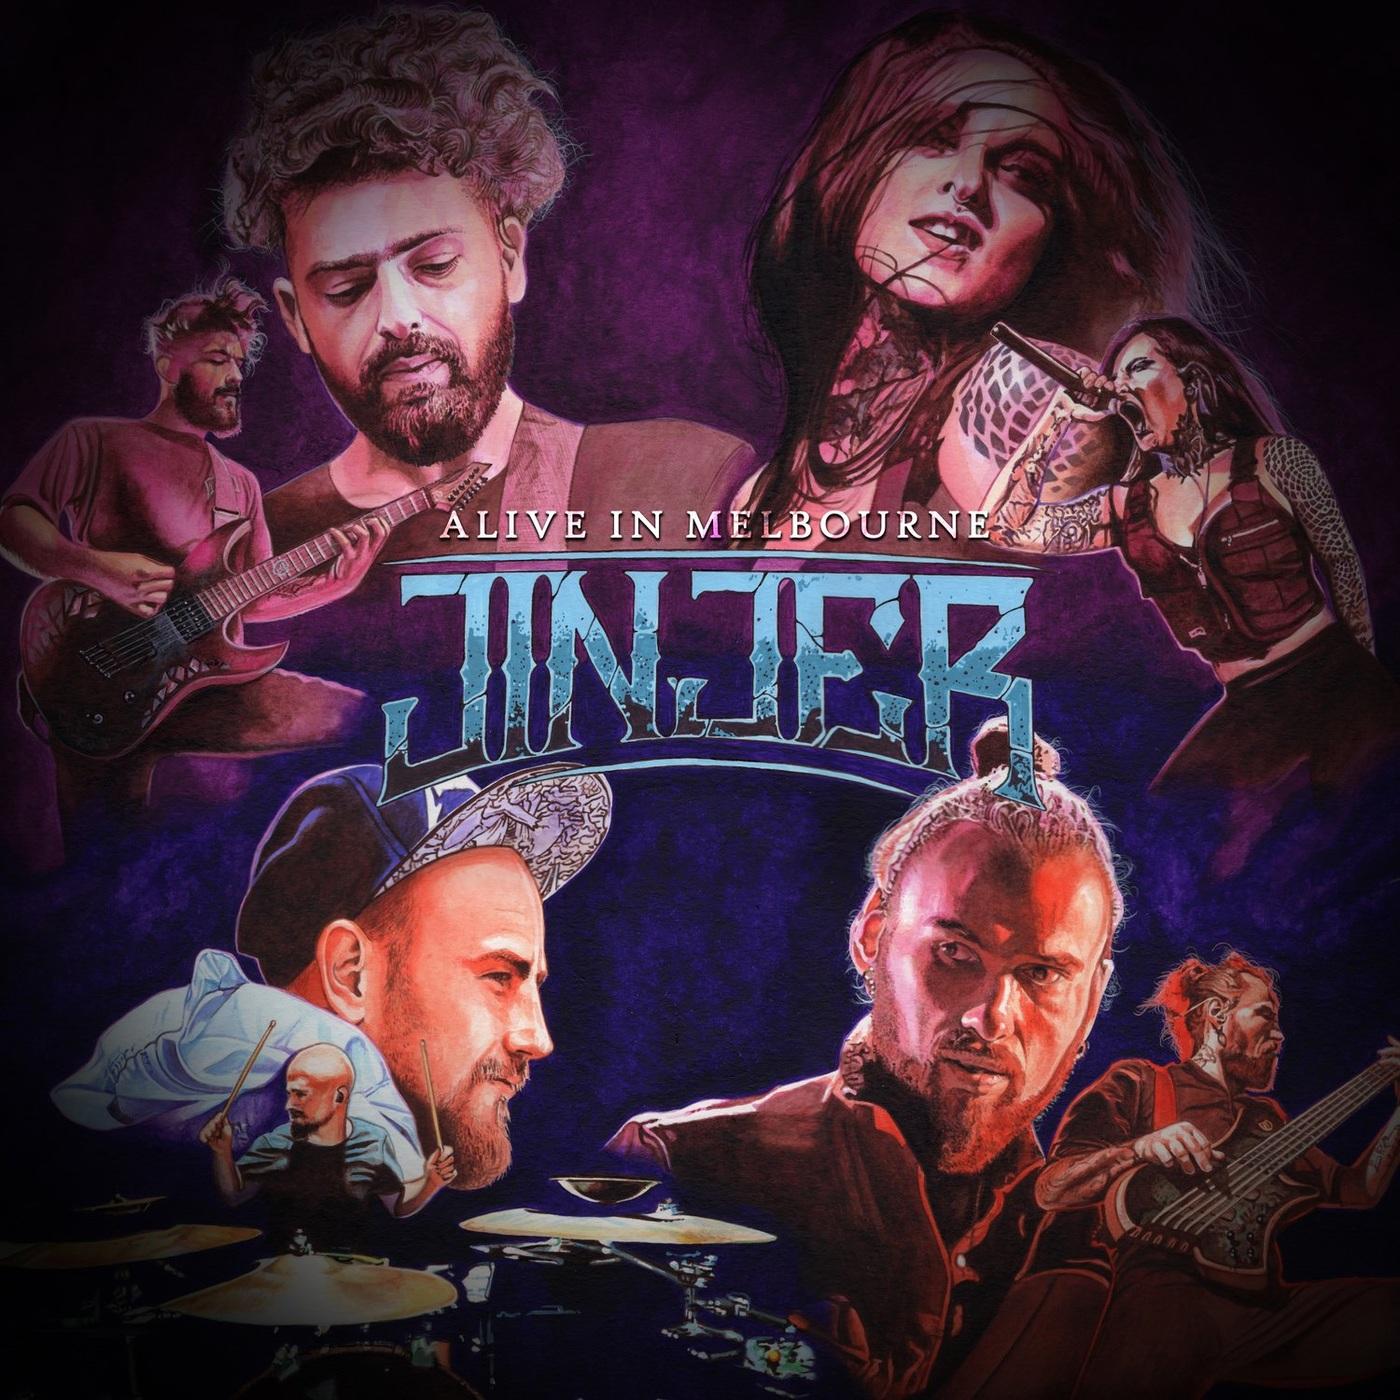 Jinjer - Alive in Melbourne 2020 (Live) (2020)